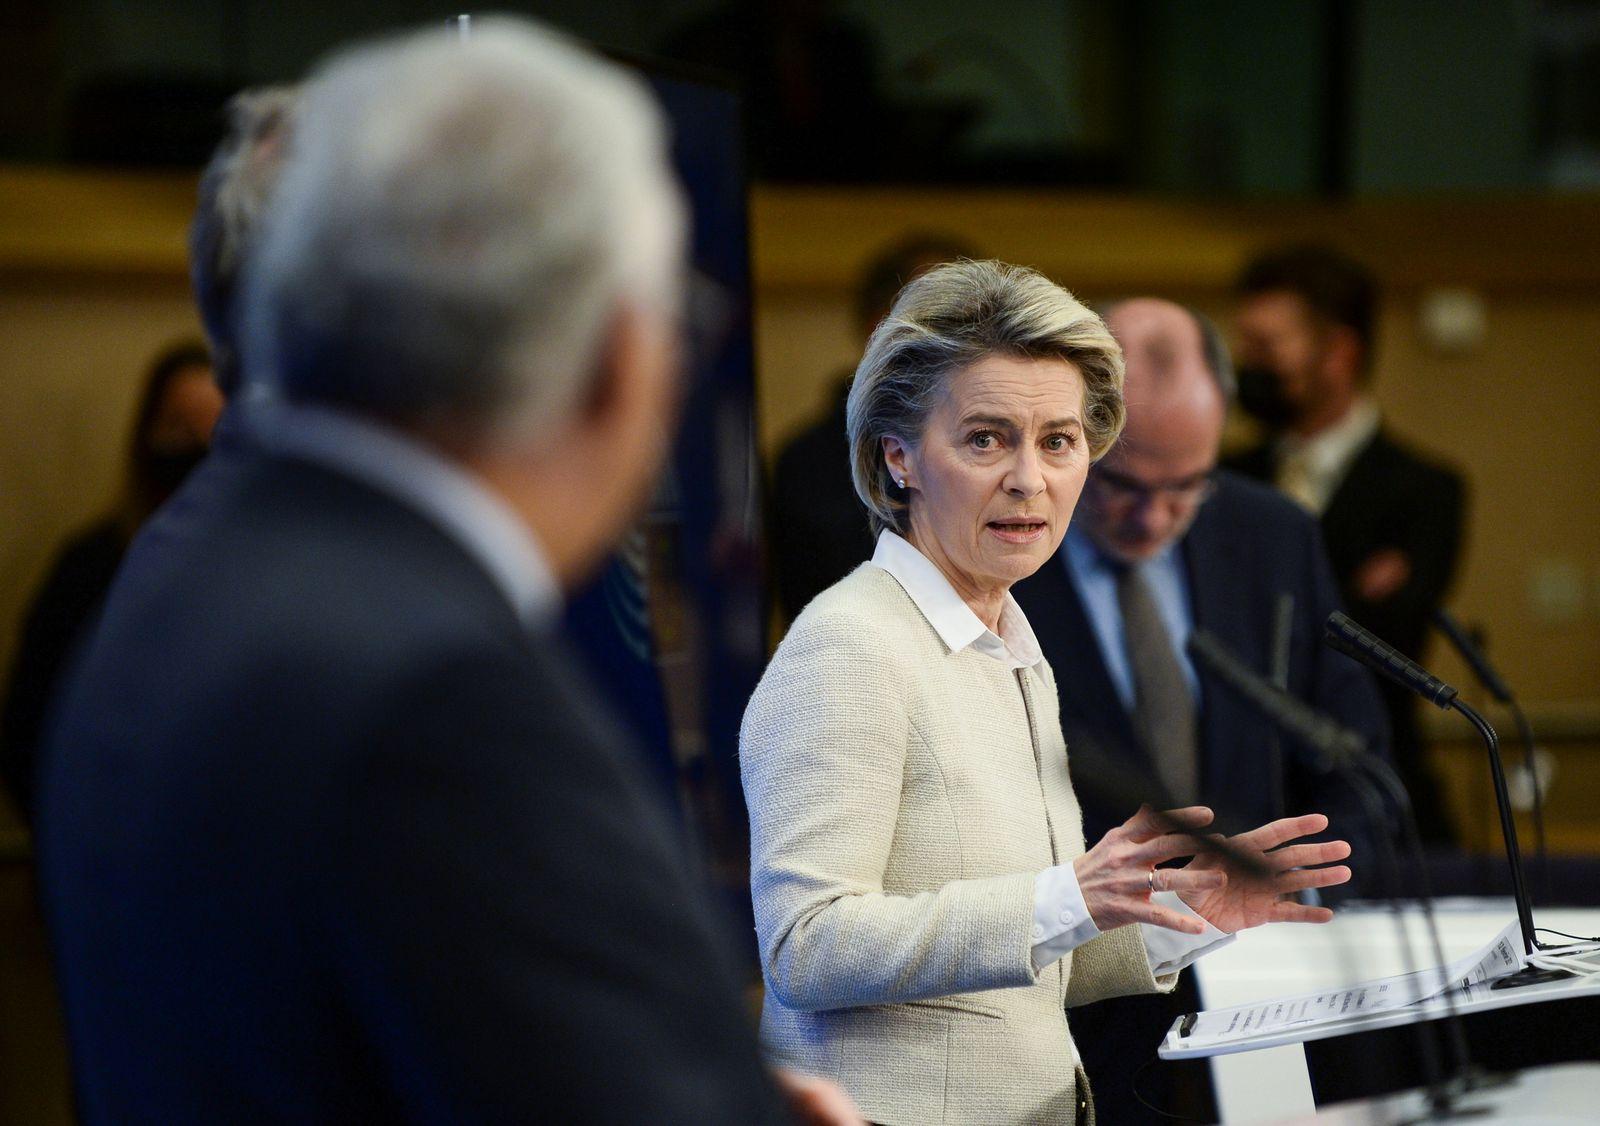 Commission President Ursula von der Leyen speaks during a news conference in Brussels